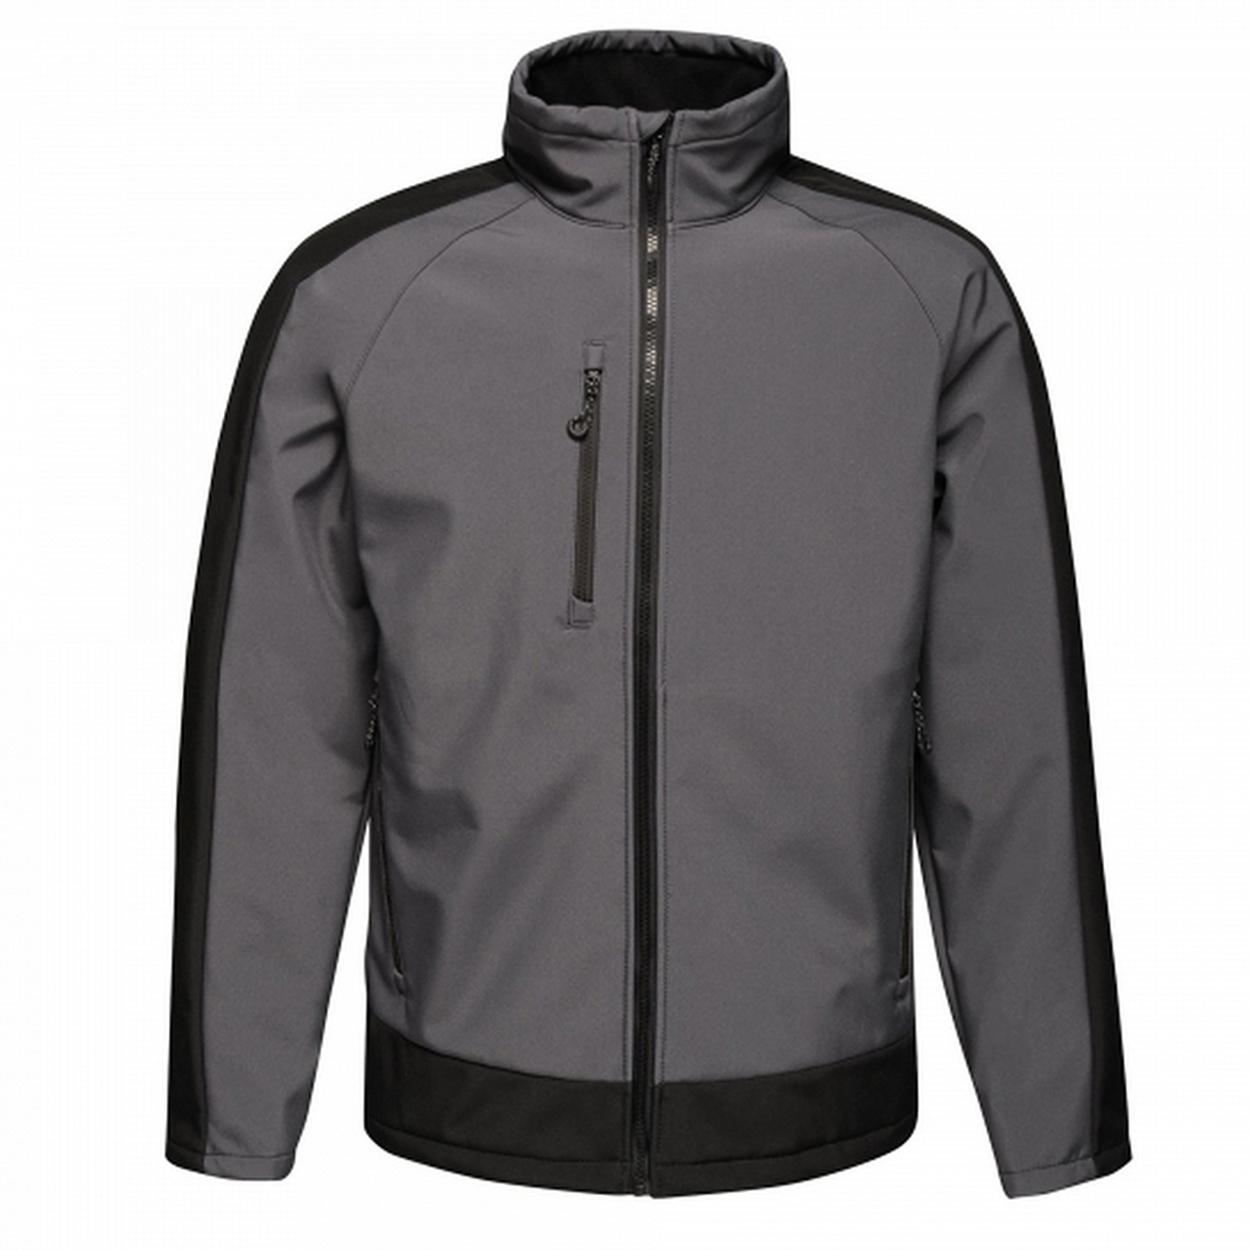 Regatta Mens Contrast 3 Layer Softshell Full Zip Jacket (XL) (Slate Grey/Signal Black)